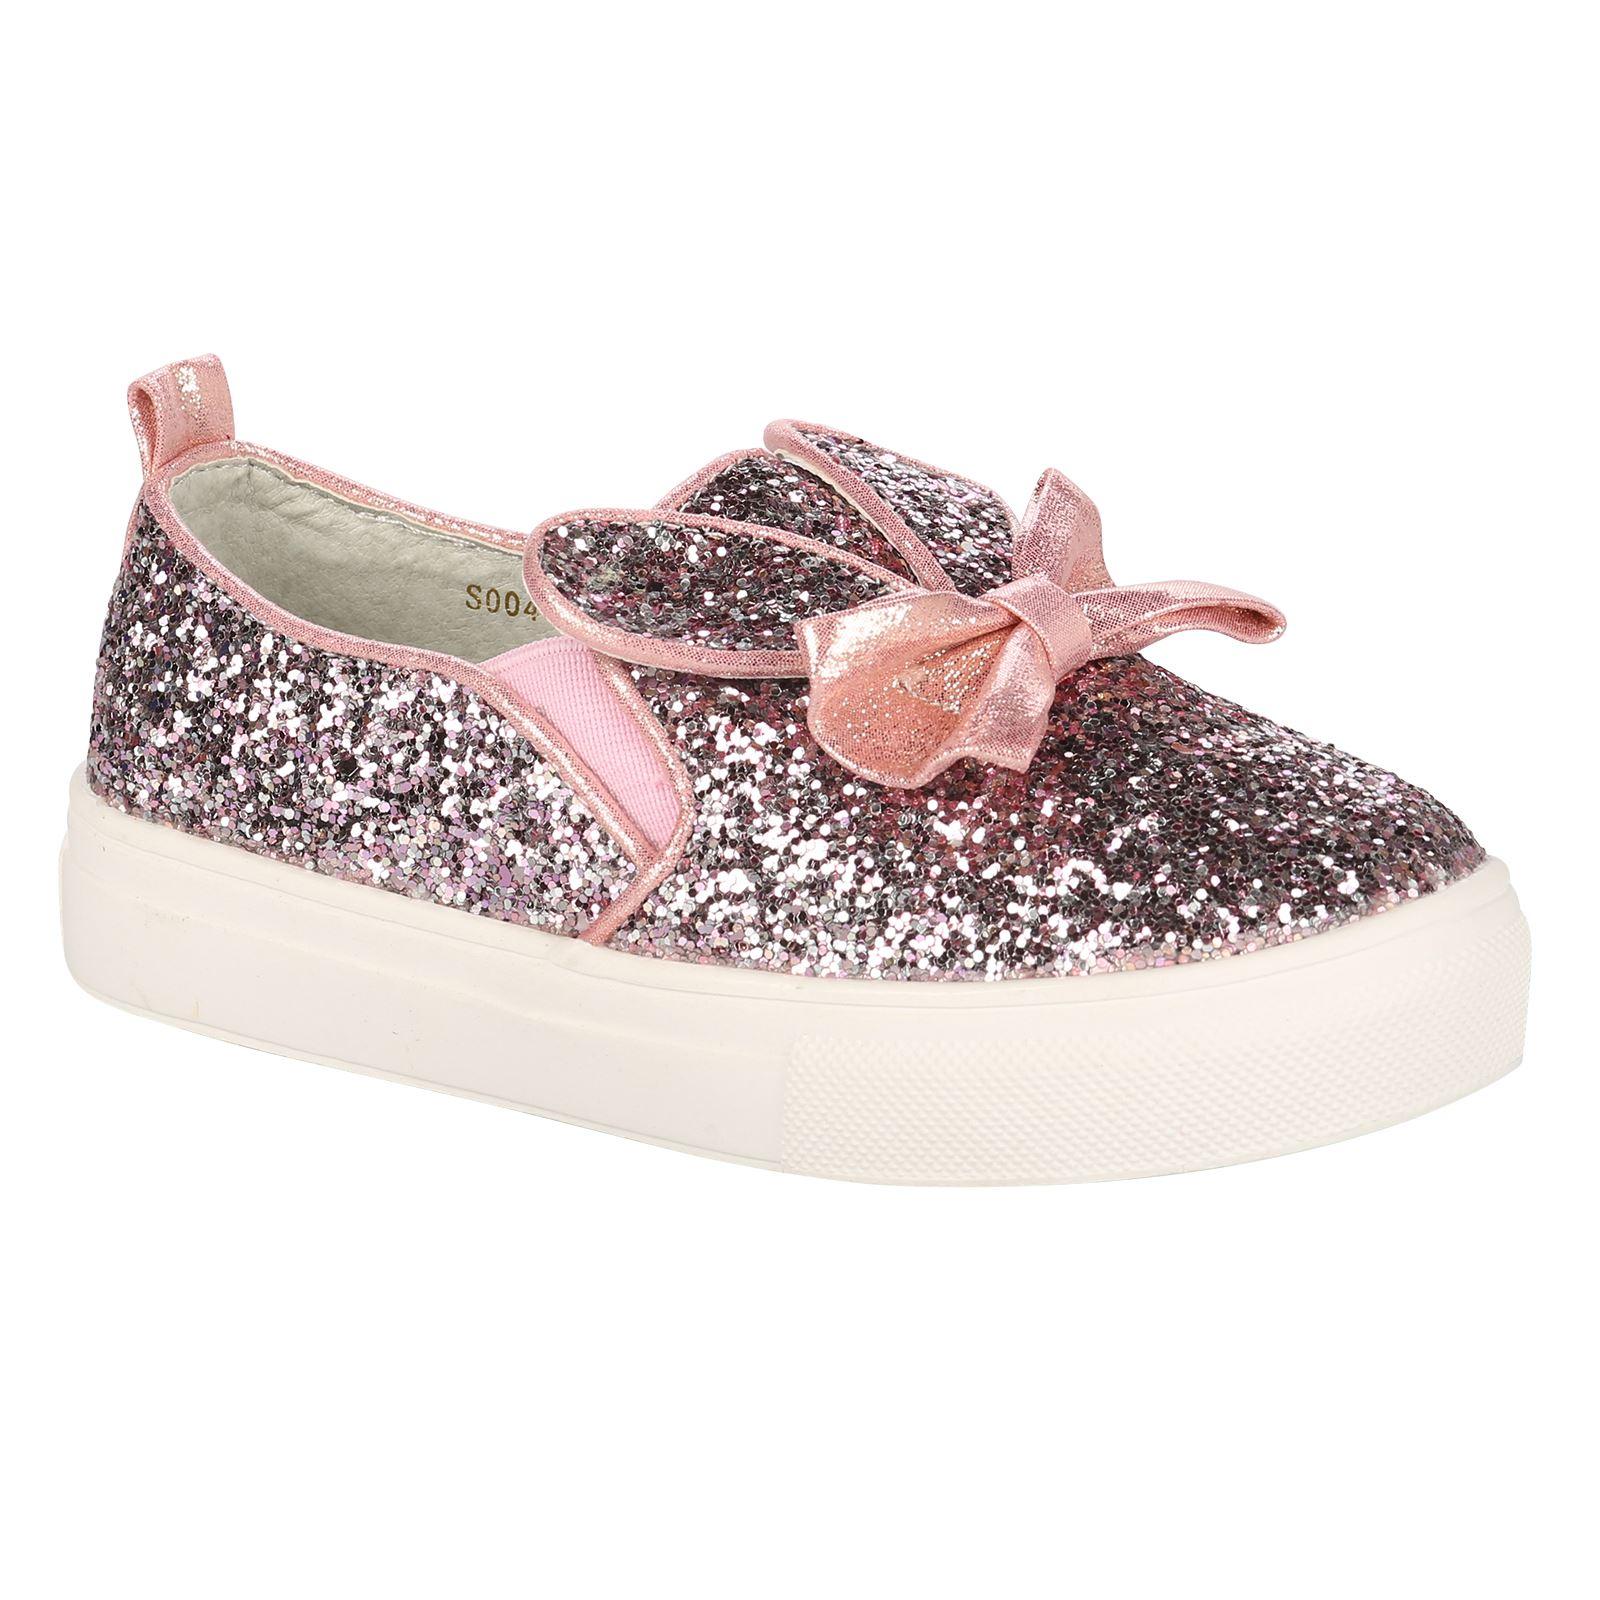 Glitter Kicks customized bling Nike shoes. Blinged out Nike shoes. Blinged out Adidas shoes.